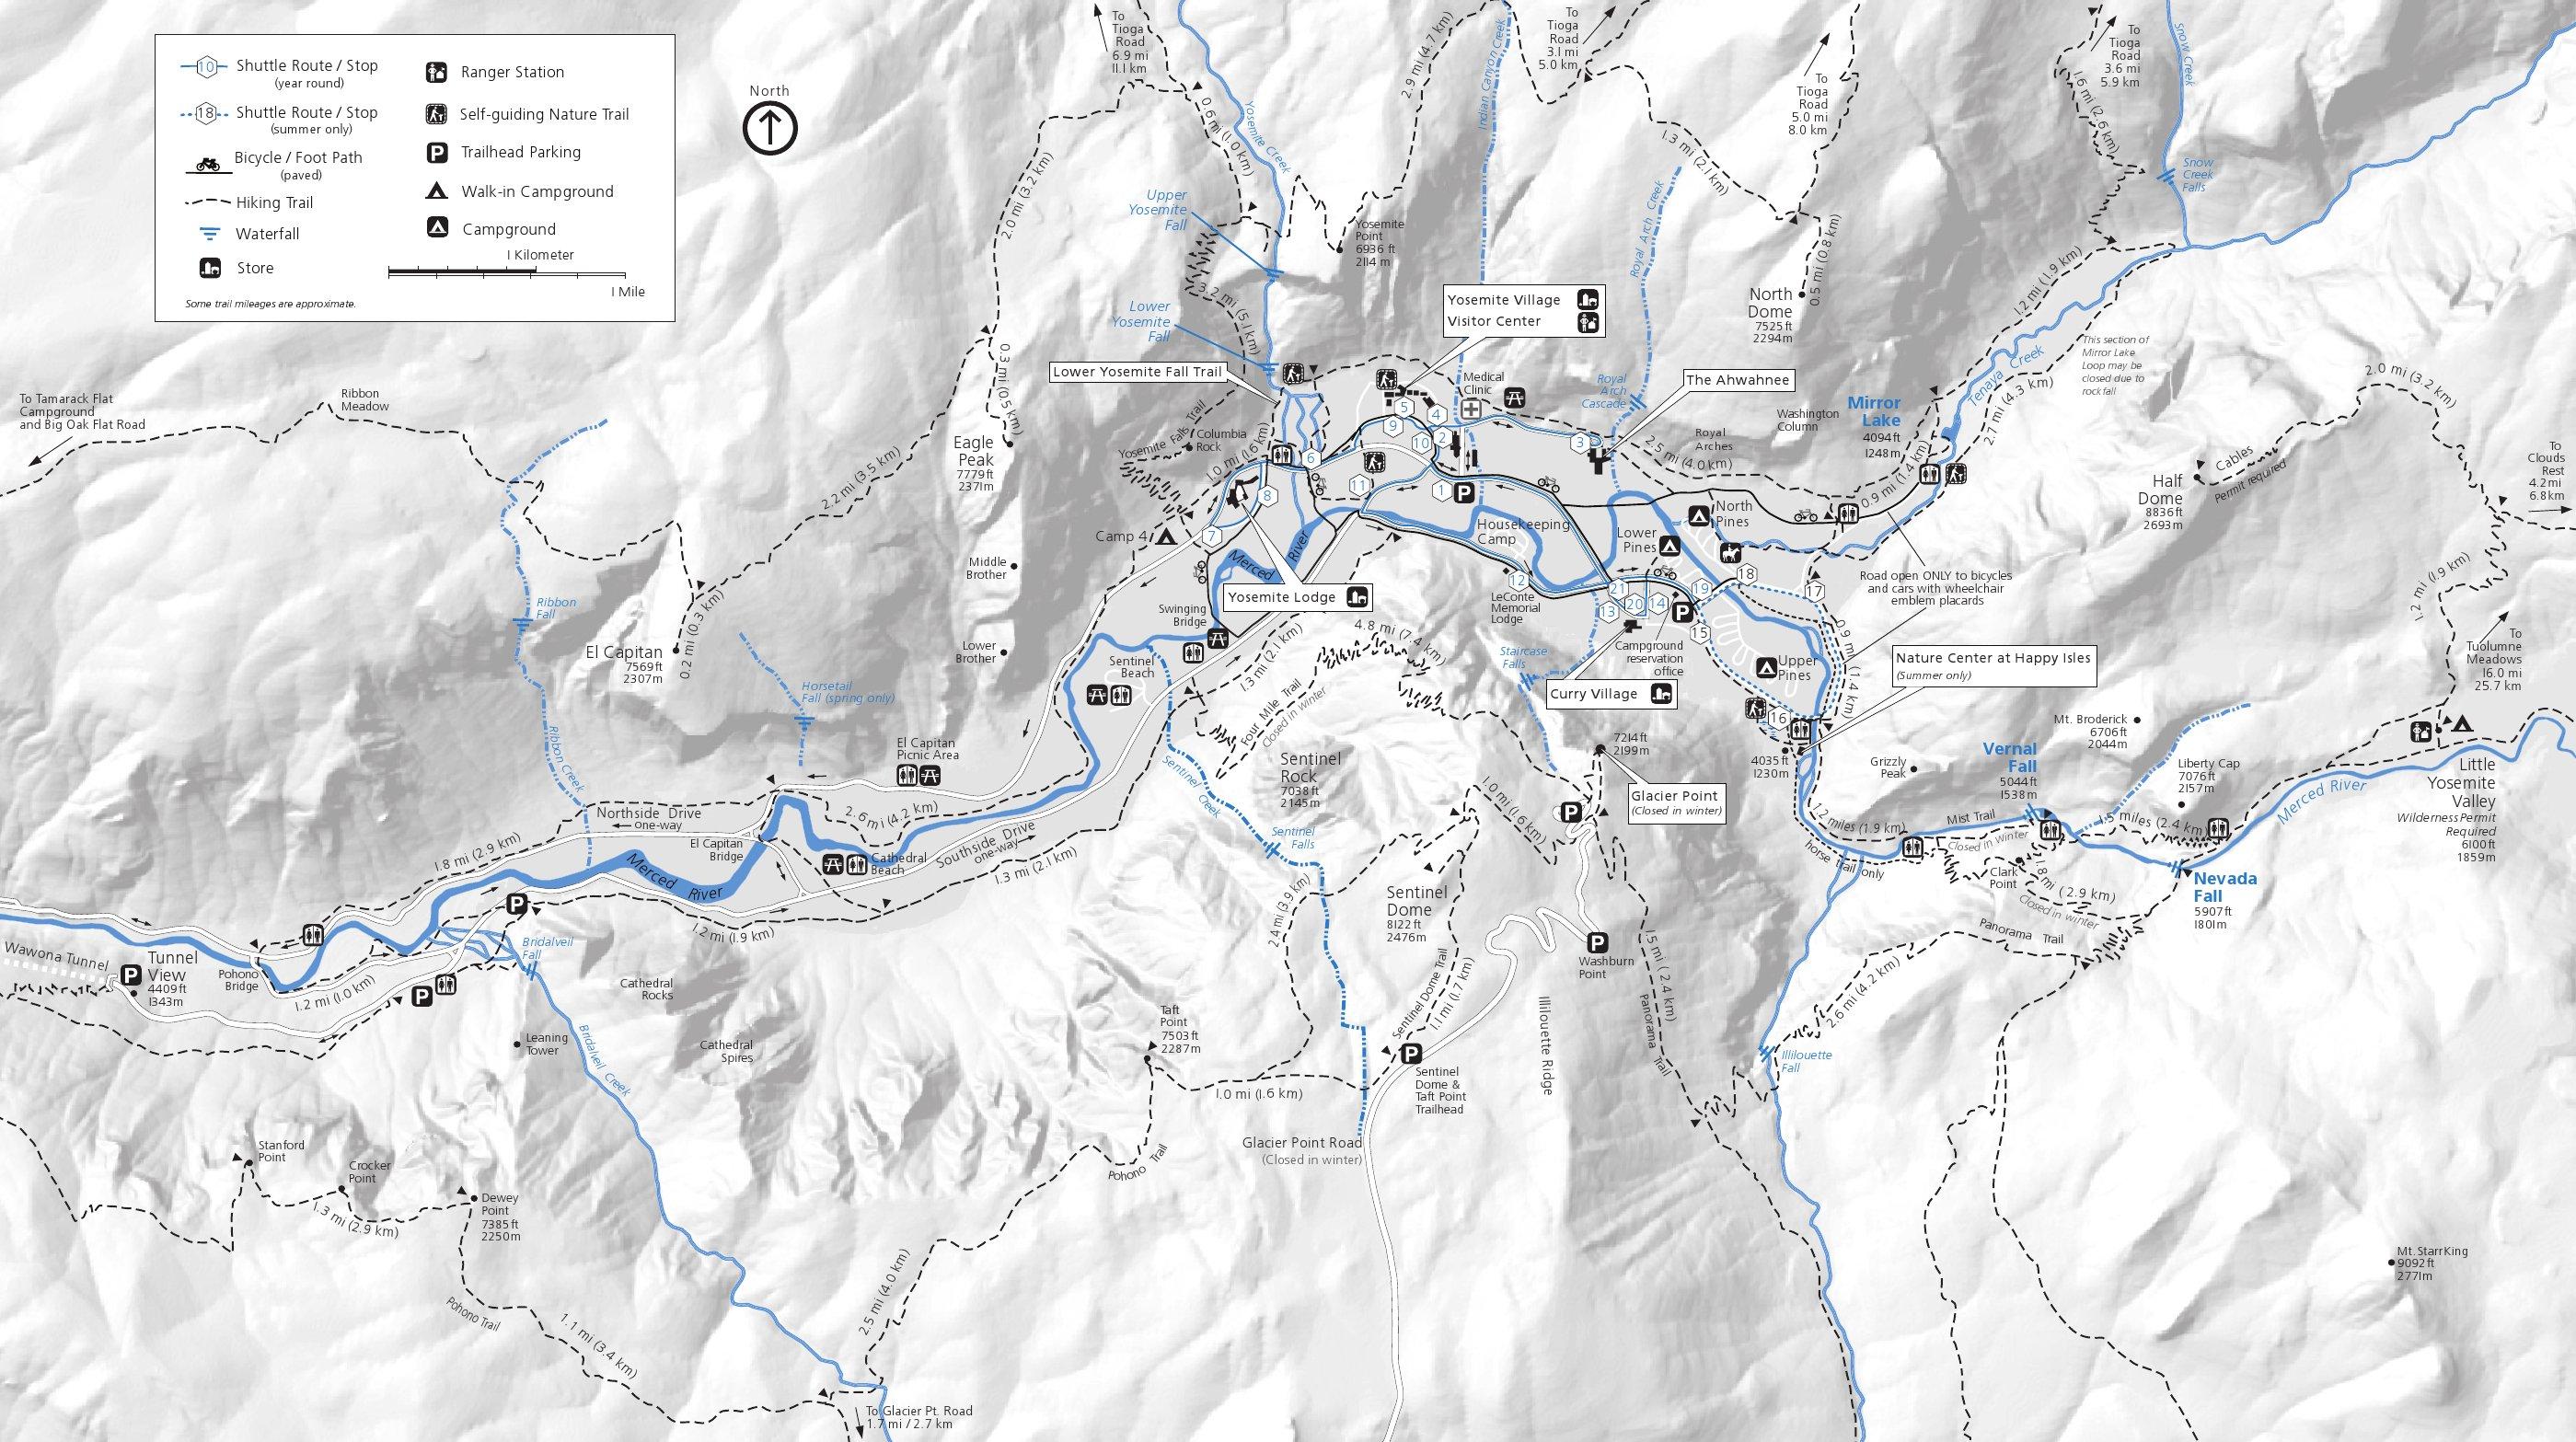 Yosemite Valley Map Yosemite Maps | NPMaps.  just free maps, period. Yosemite Valley Map